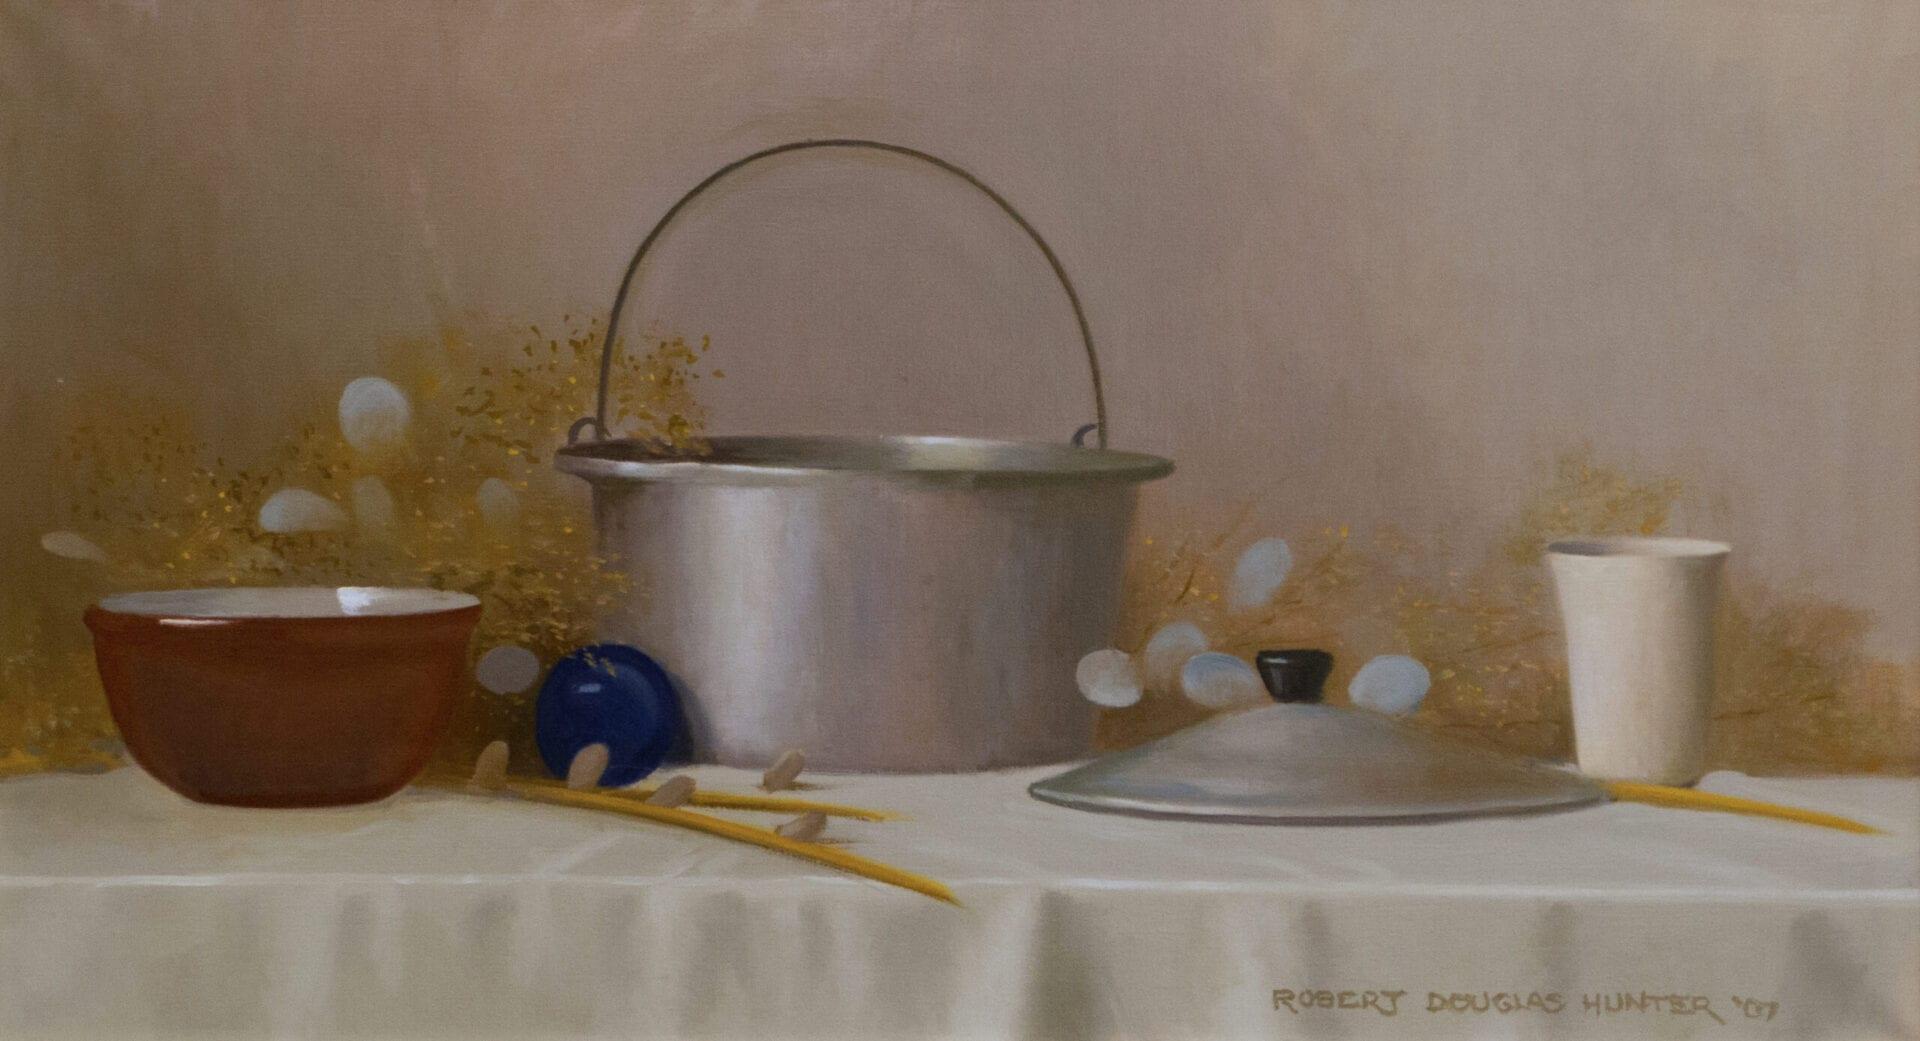 Robert Douglas Hunter - Still Life with Aluminum Cooking Kettle